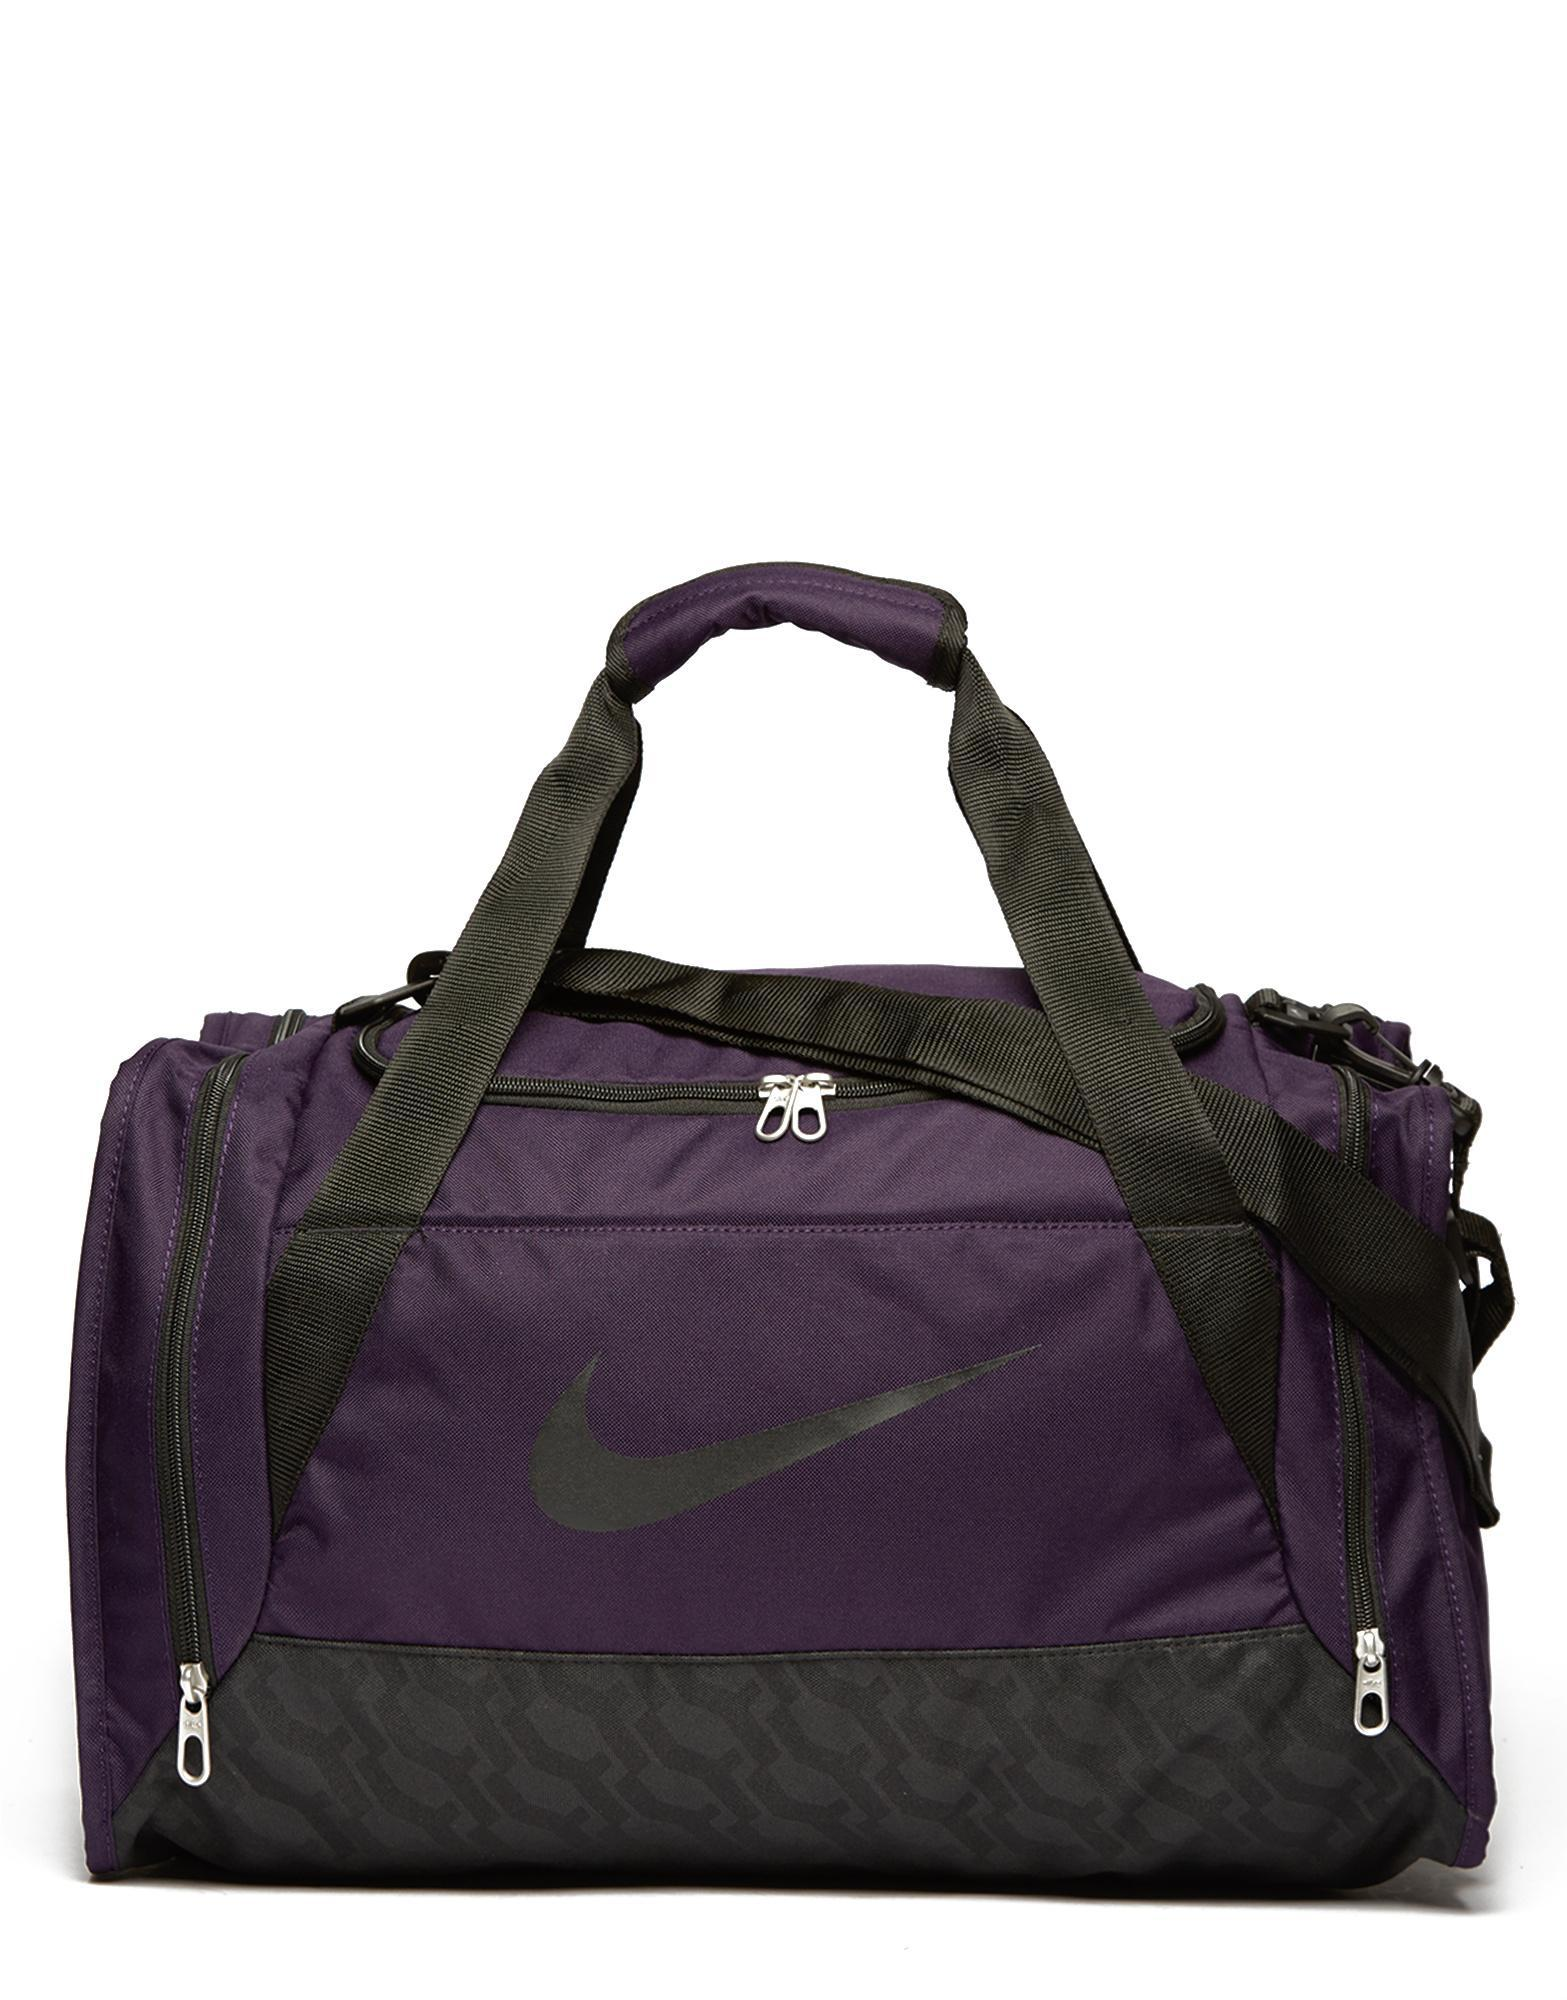 ecd6217333 Lyst - Nike Brasilia Small Duffle Bag in Purple for Men